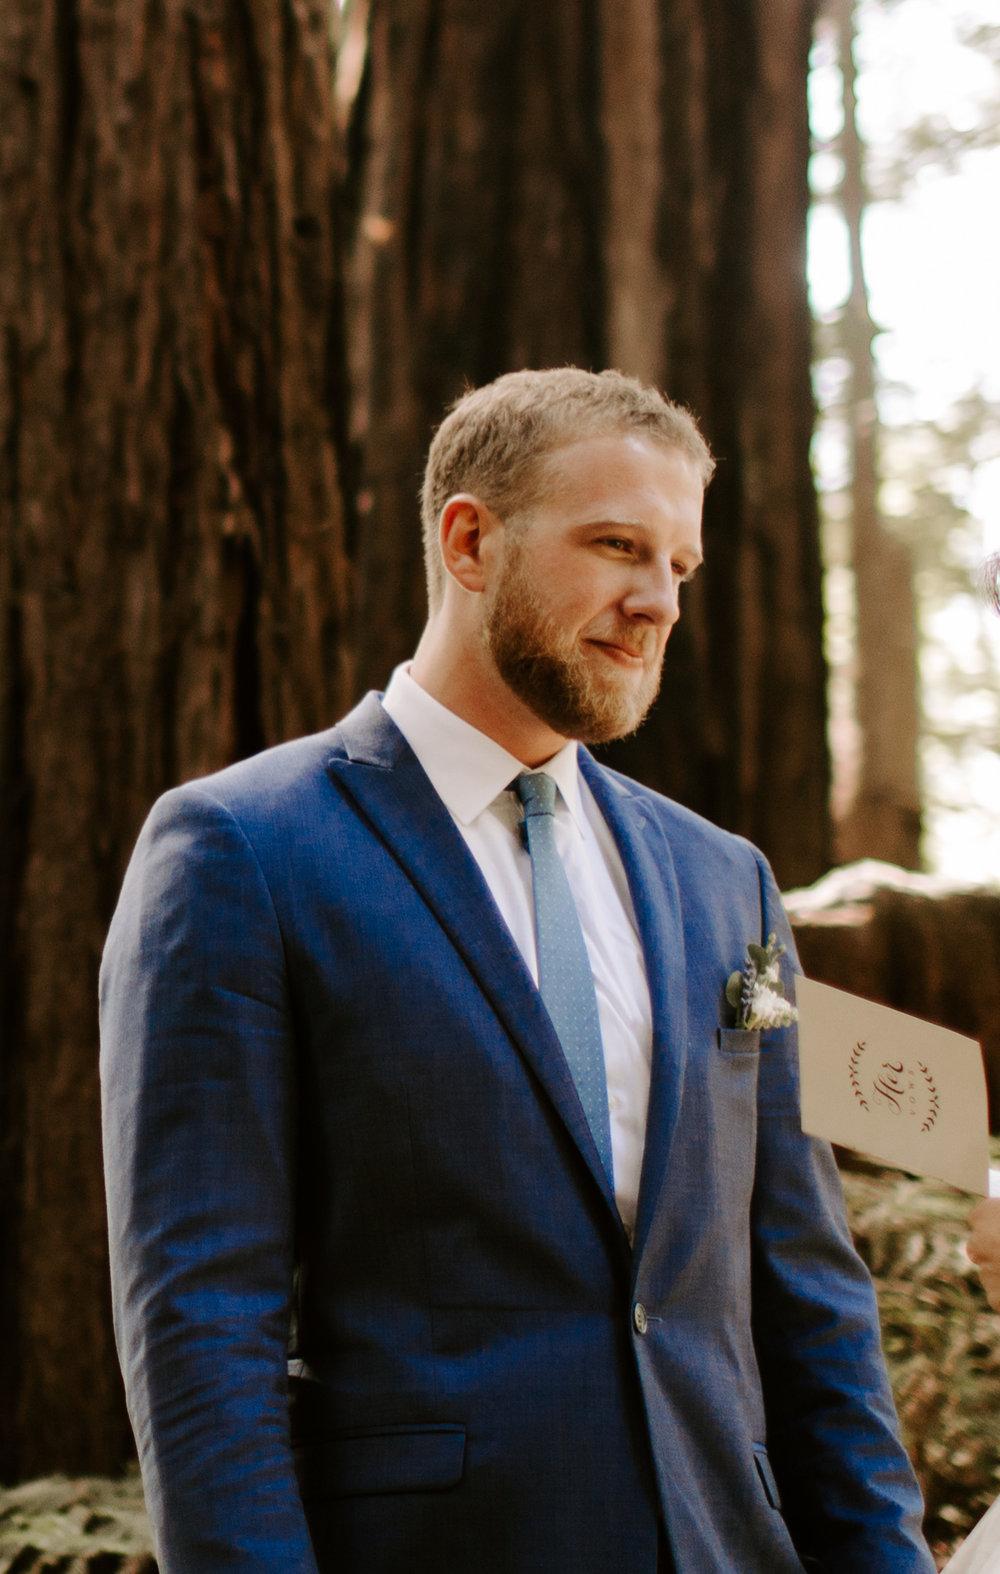 pheiffer beach big sur california wedding first look-1-15.jpg